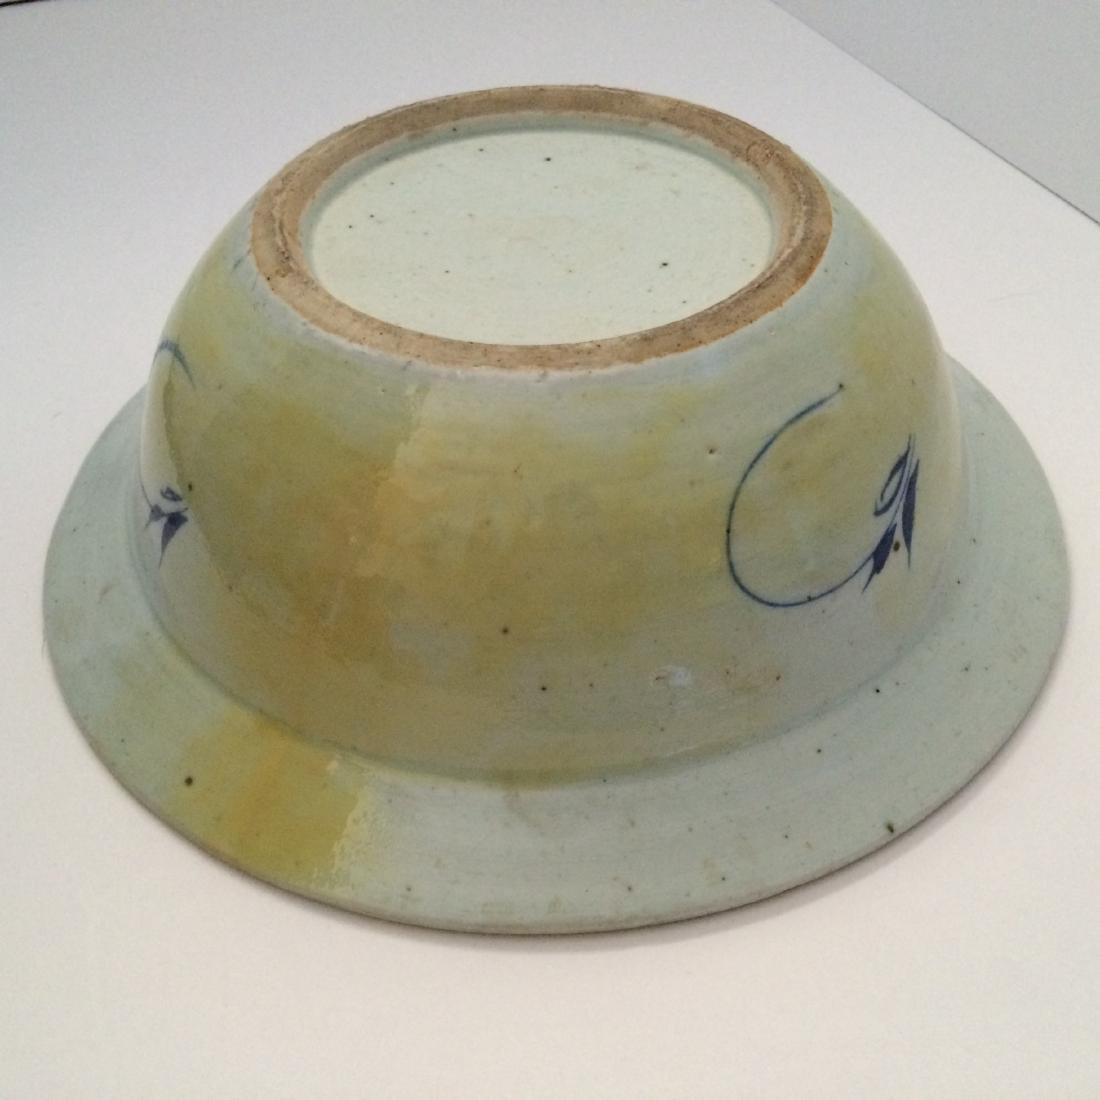 Chinese Chin Dynasty Style Washing White/Blue Bowl - 3